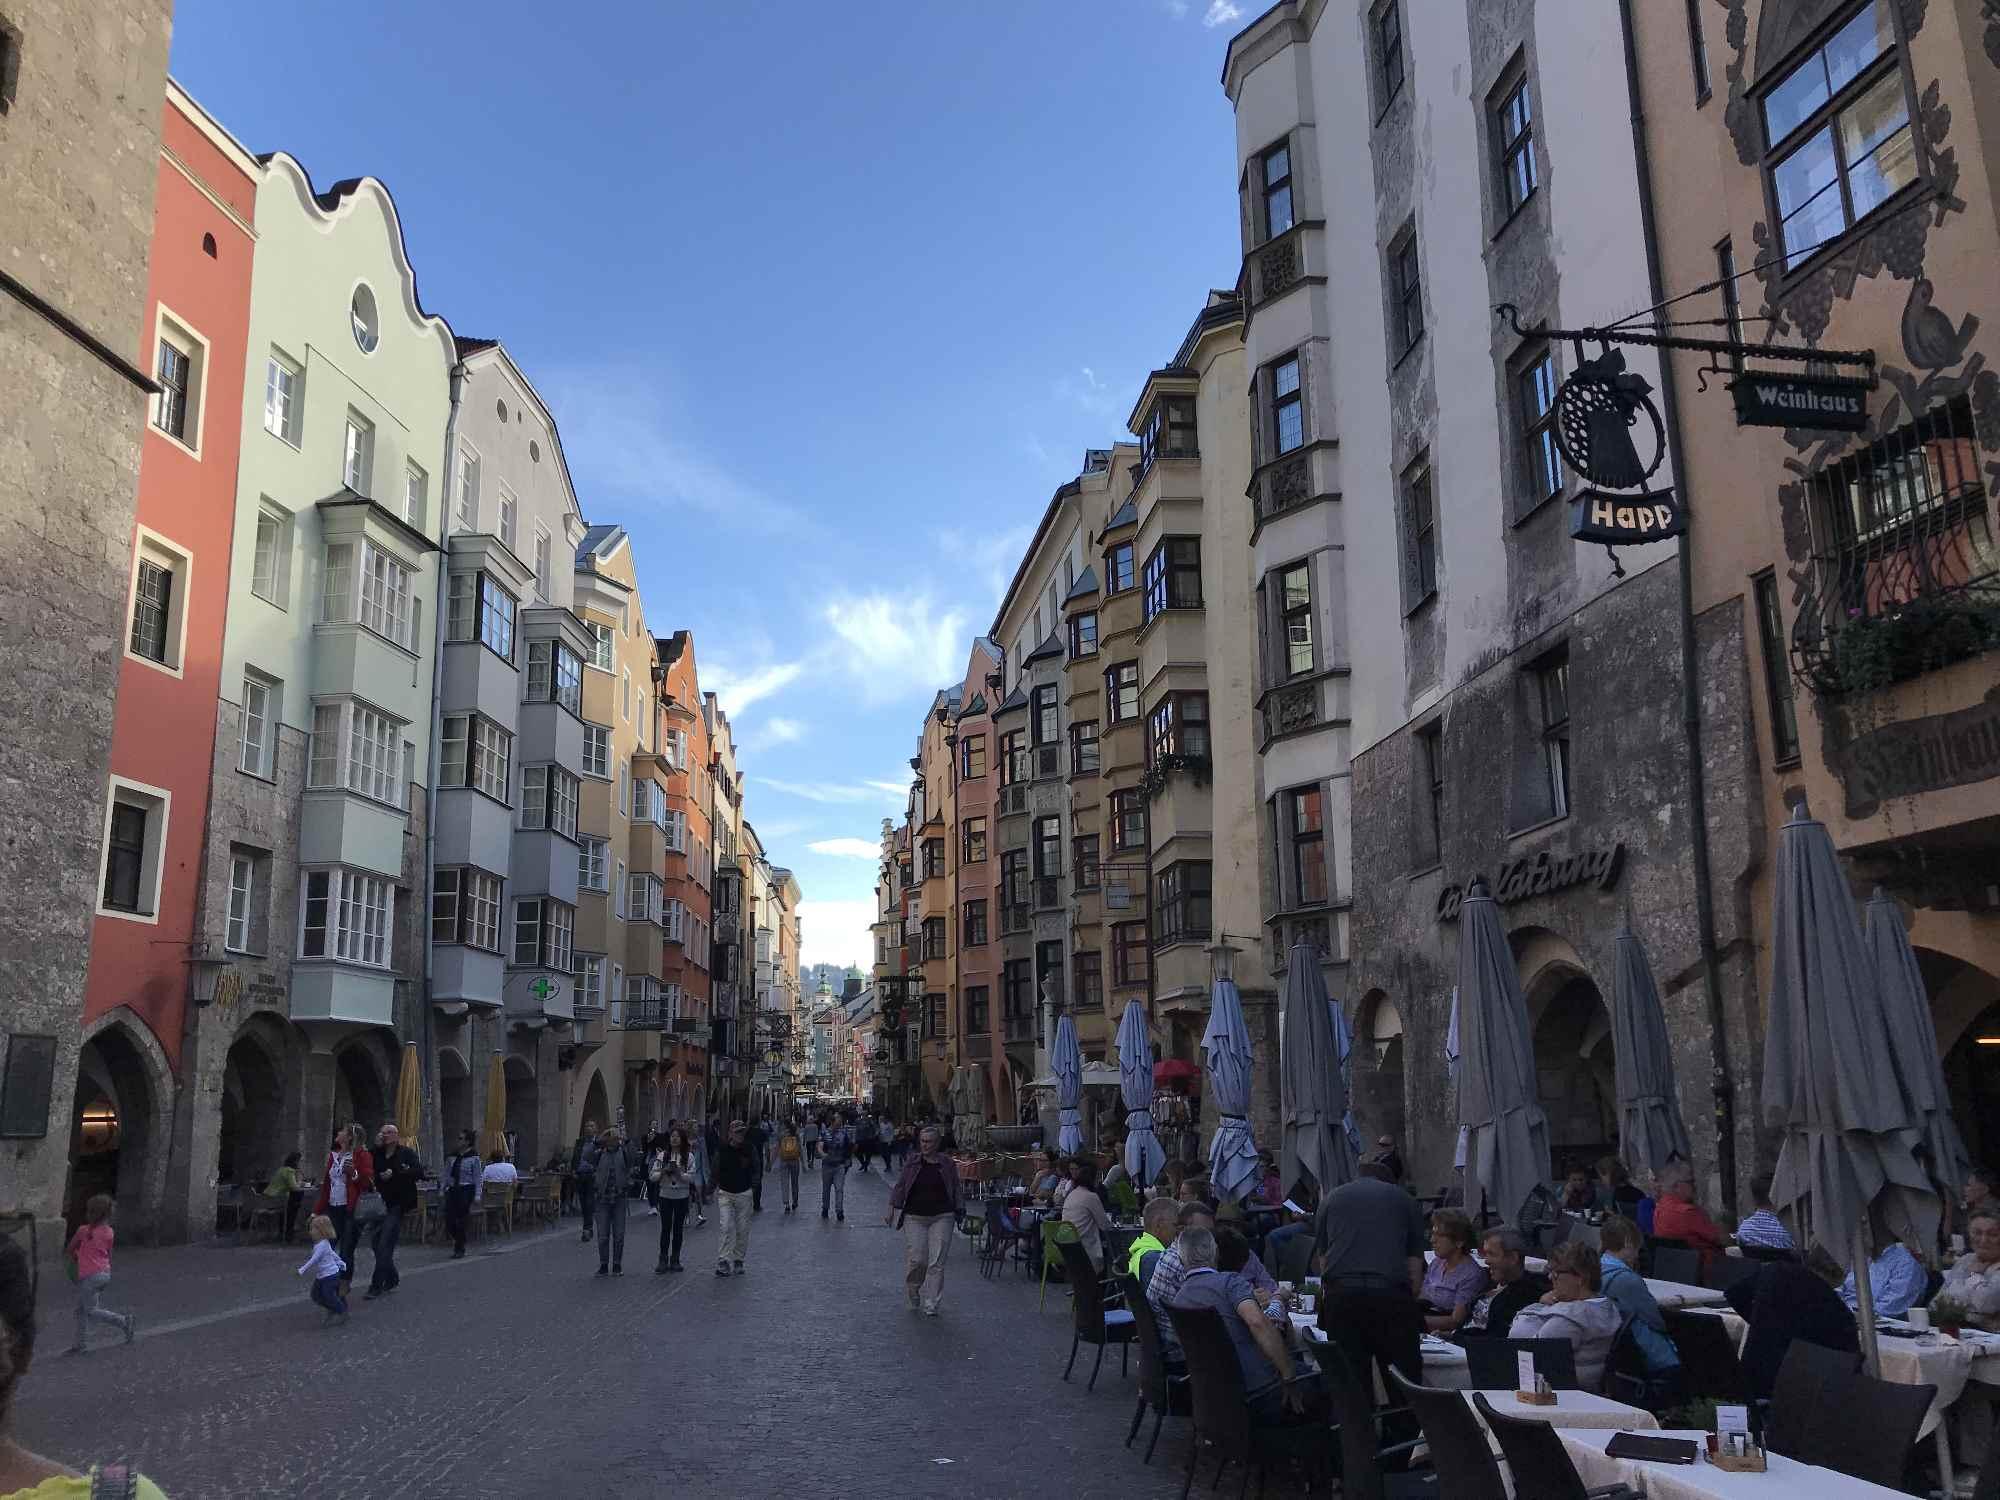 Die Altstadt in Innsbruck